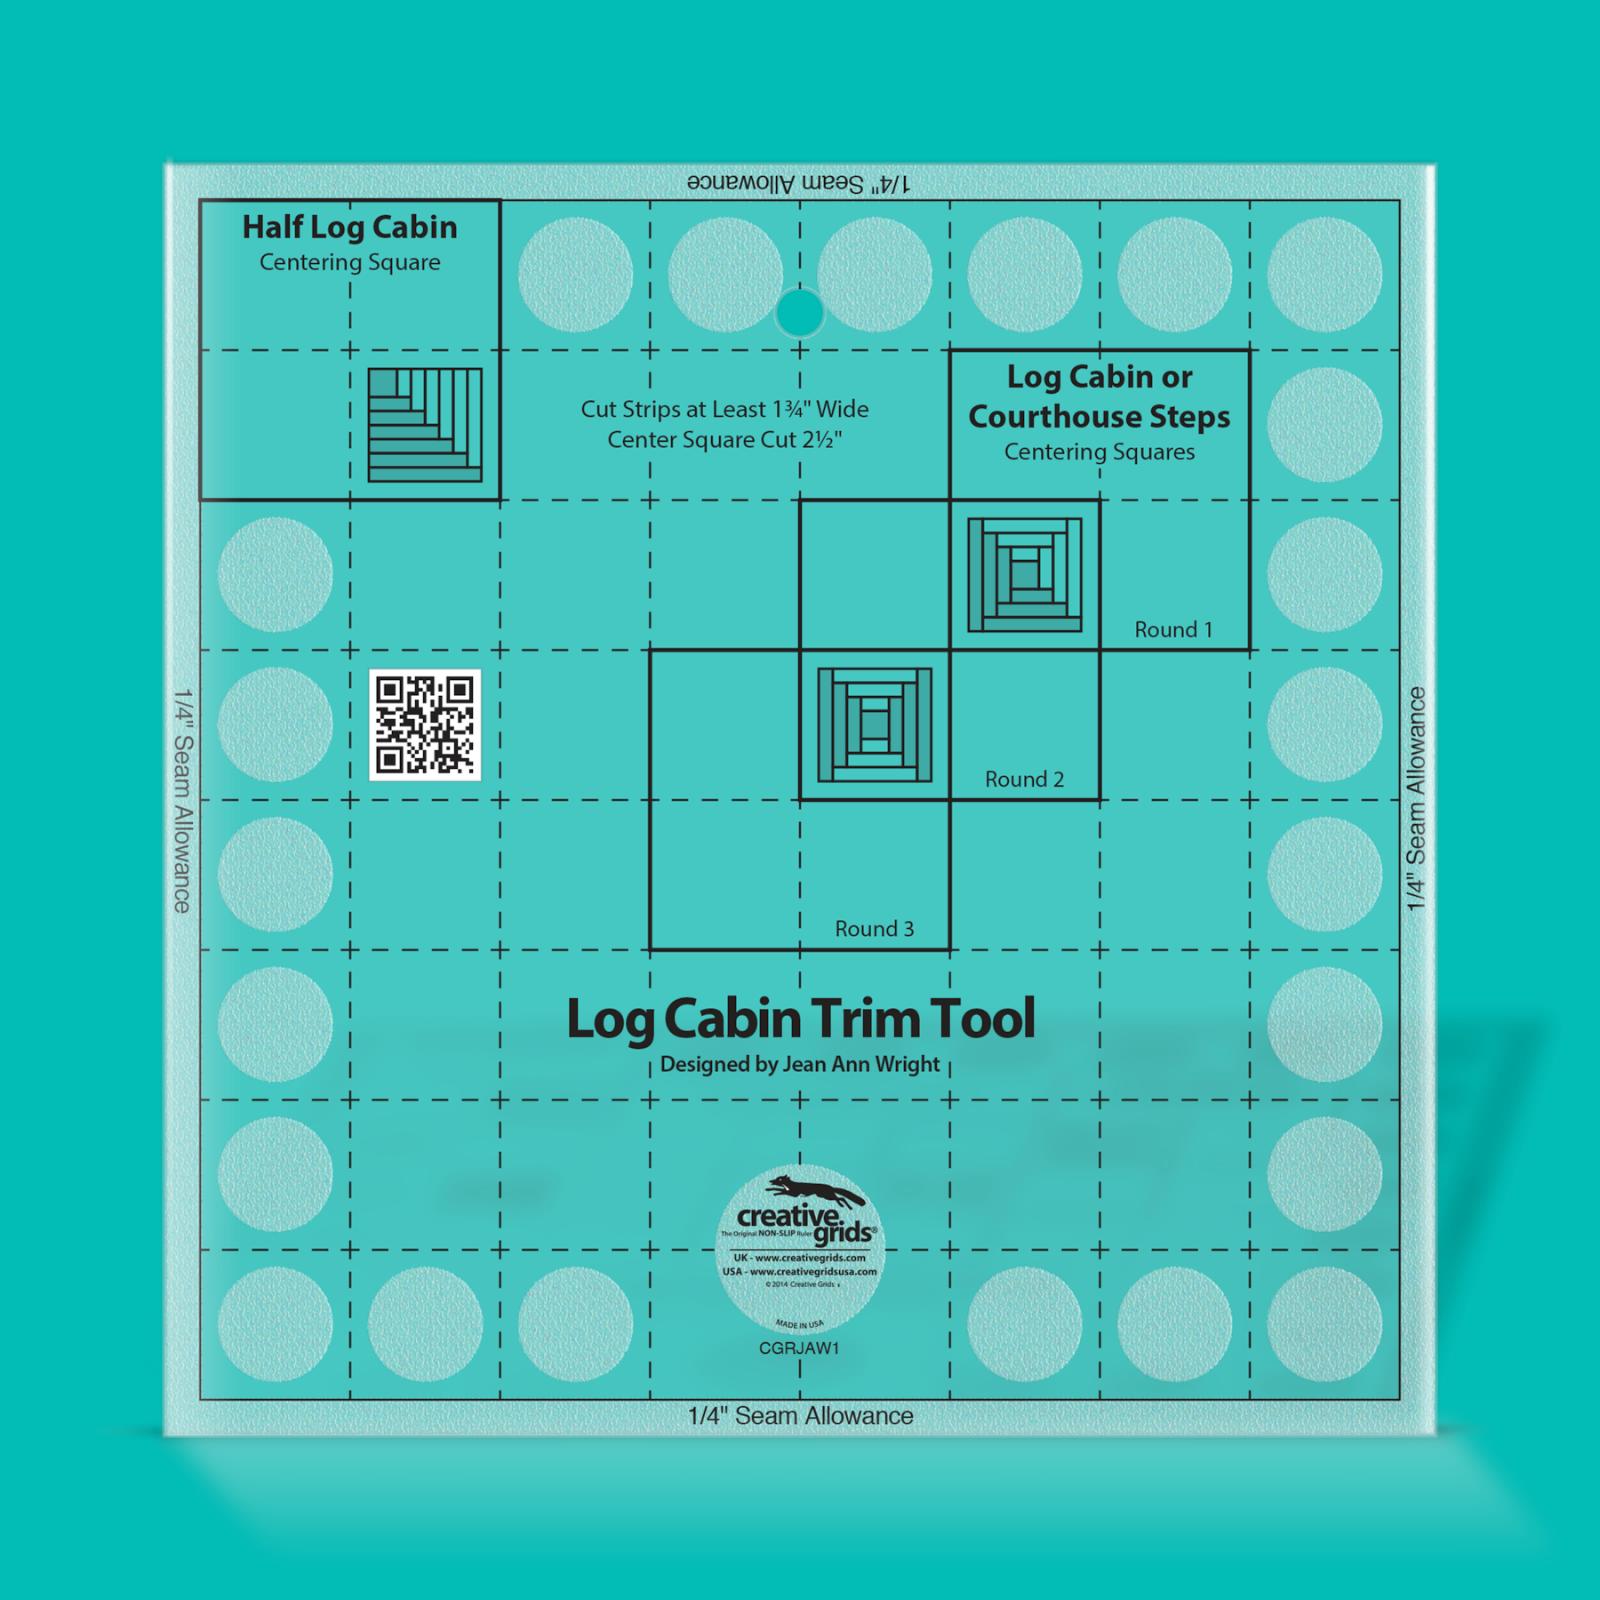 Creative Grids Log Cabin Trim Tool for 8 Finished Blocks | SKU# CGRJAW1